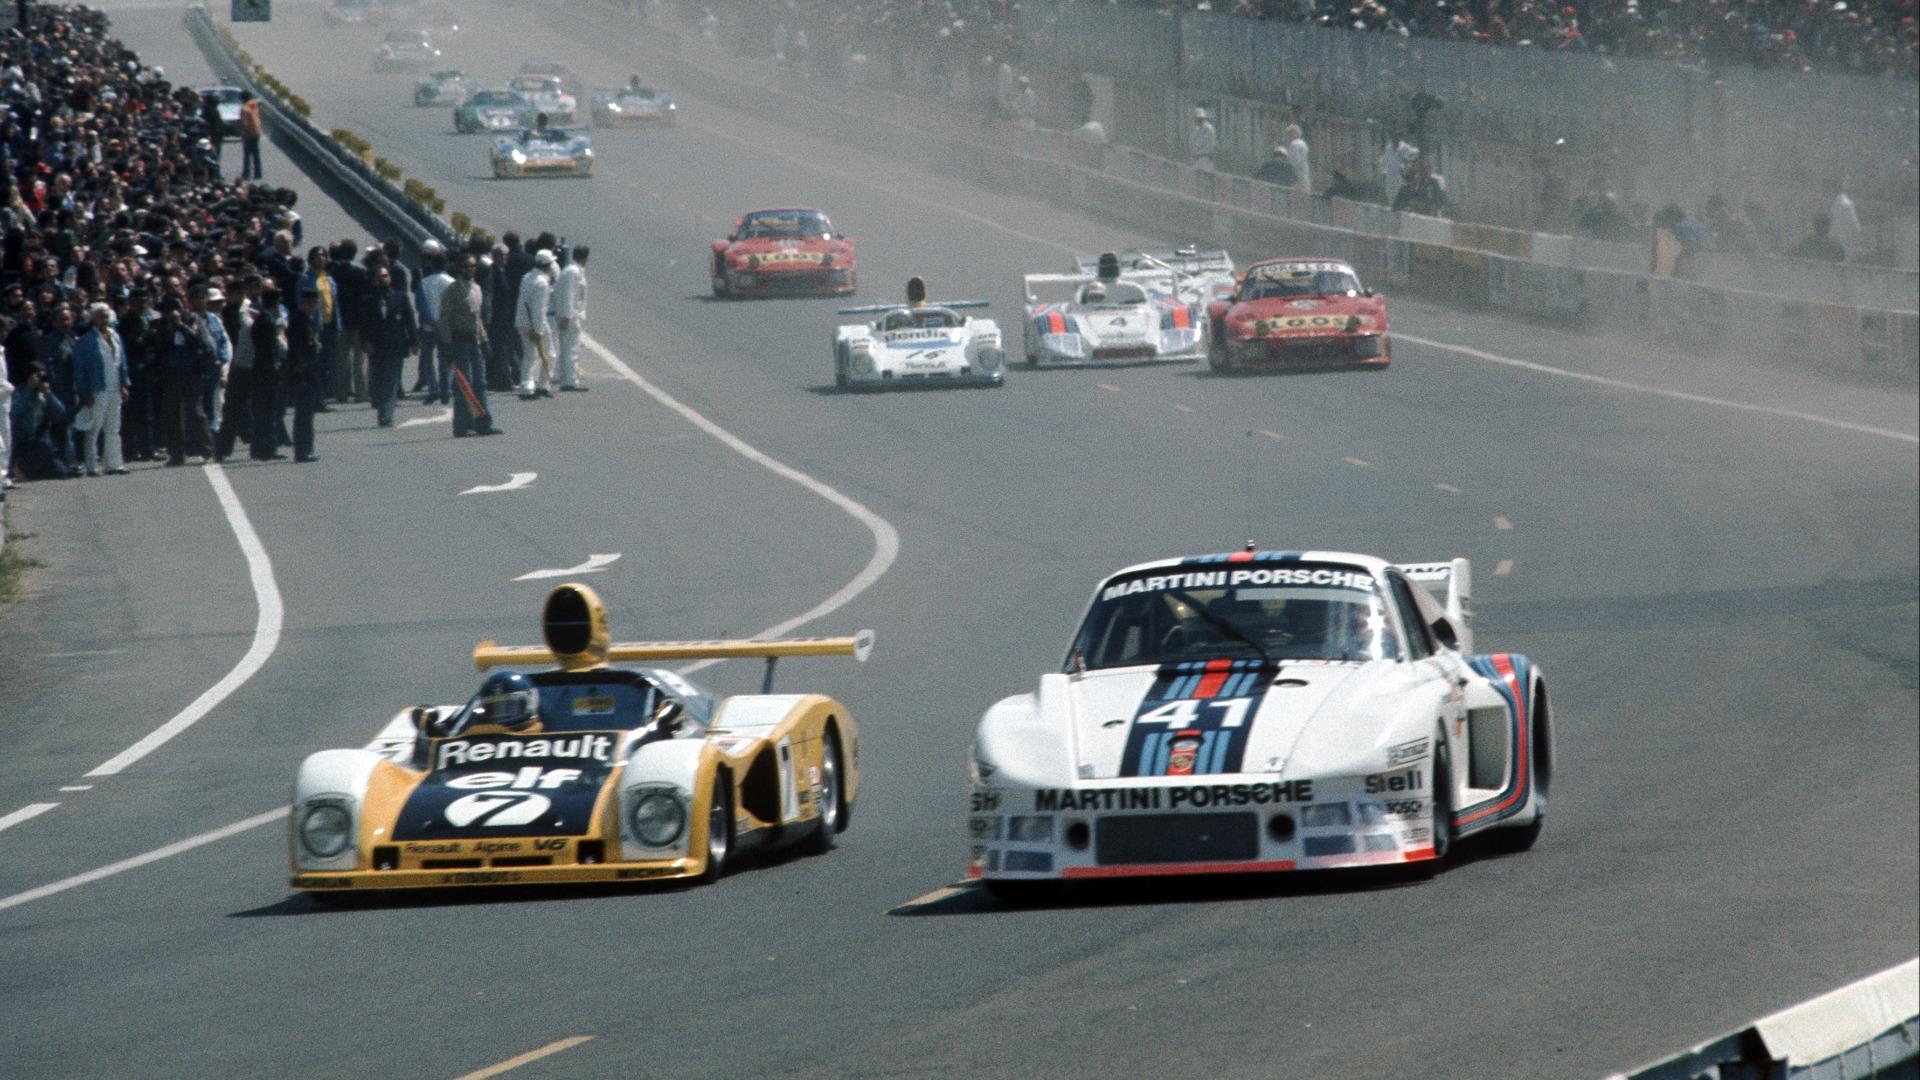 Patrick Tambay i bil #7 kjemper hardt mot en Porsche 935 under Le Mans i 1977.